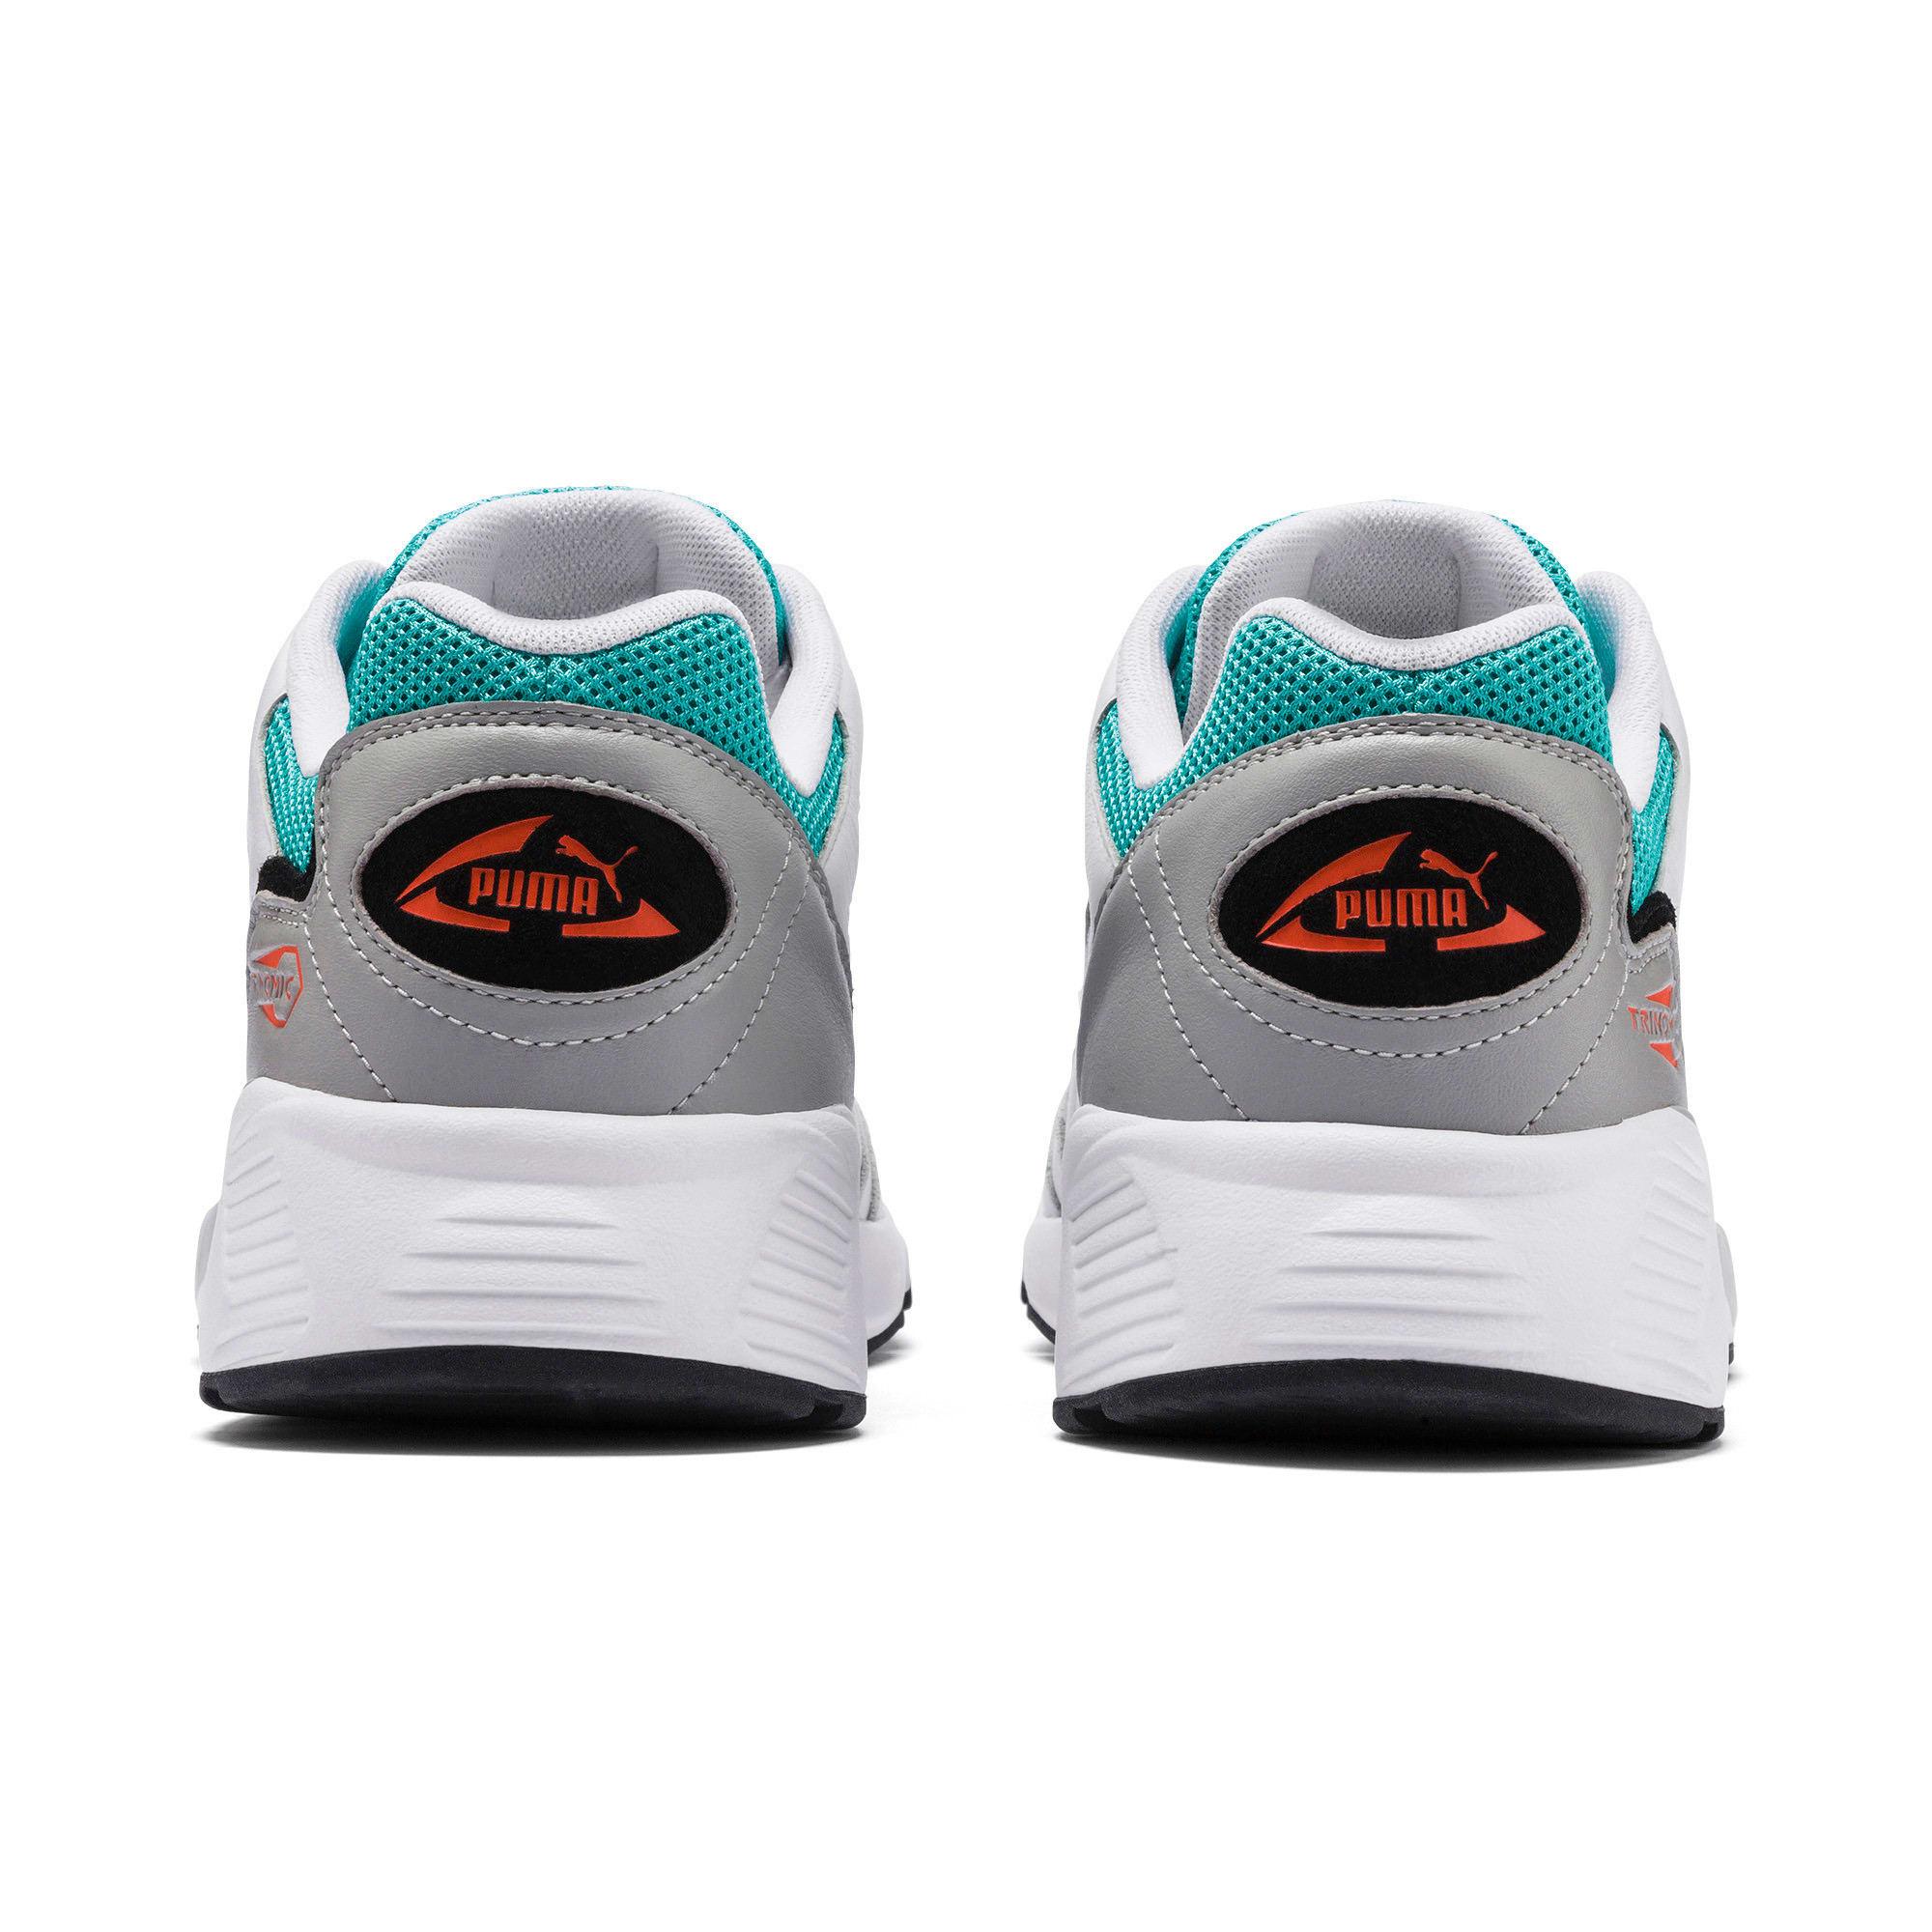 Thumbnail 3 of Prevail Classic Sneakers, Puma White-Blue Turquoise, medium